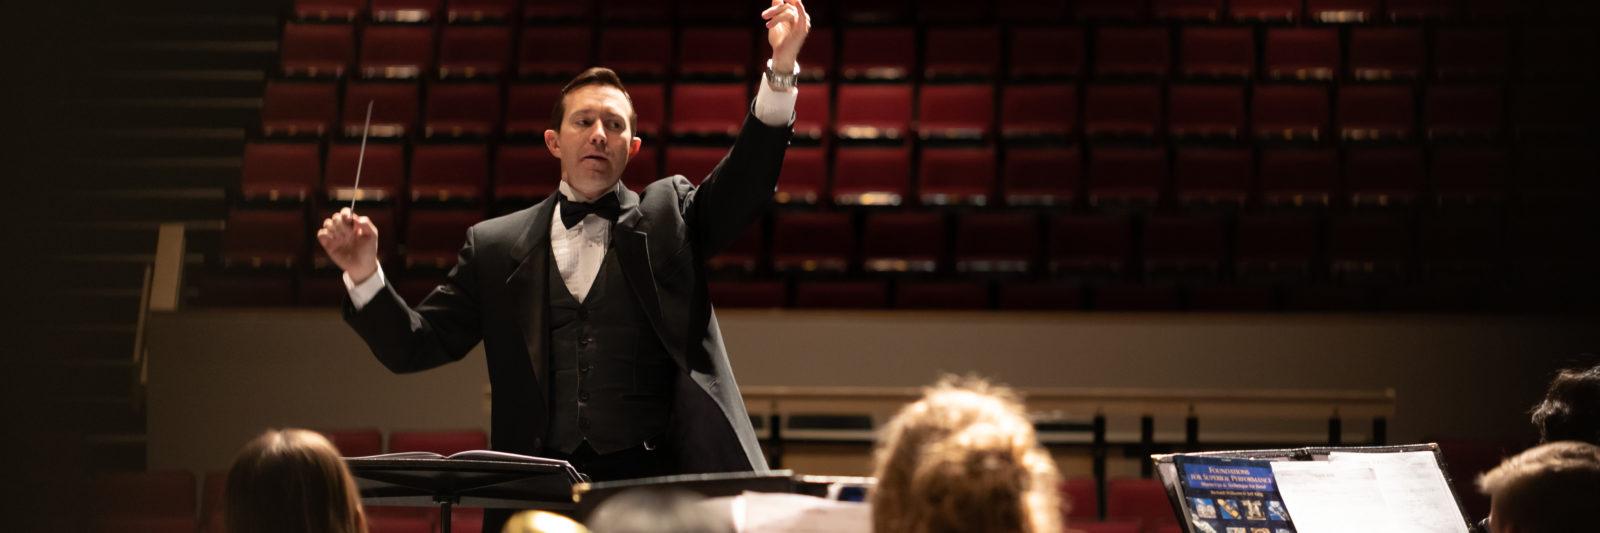 Keith Farmer Grandview High School Band Director